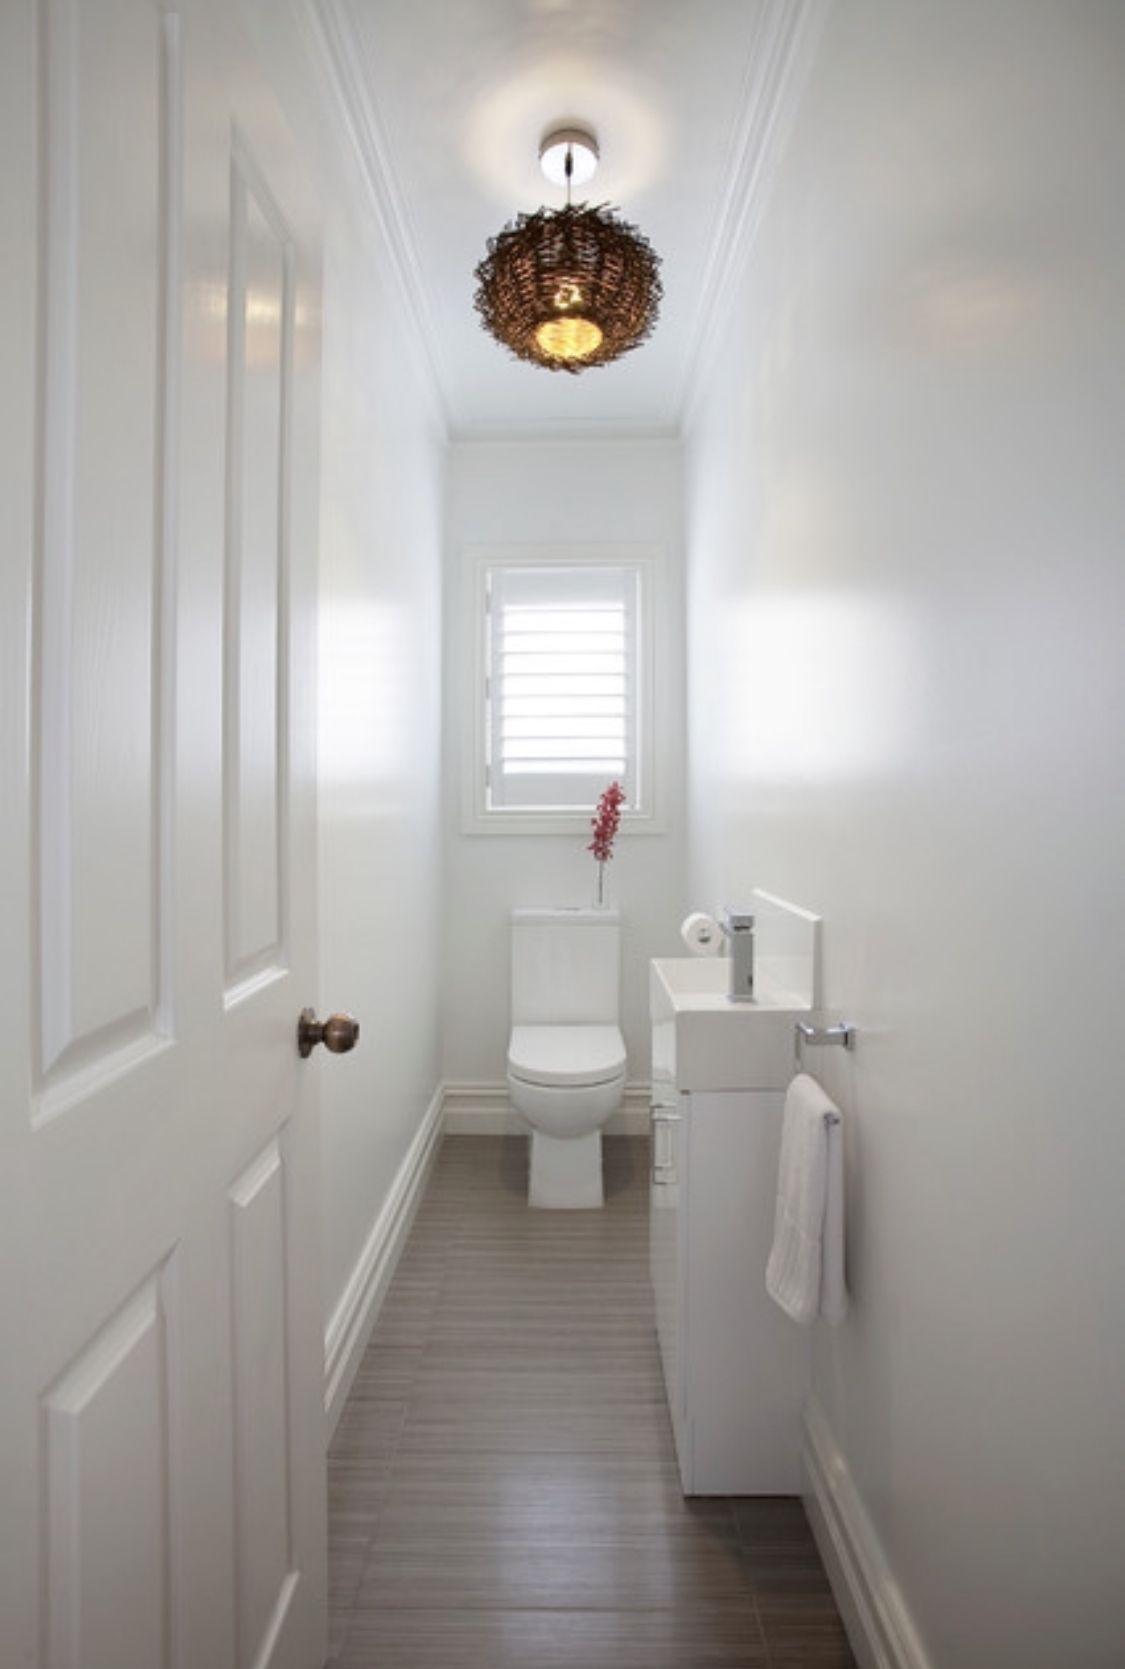 Half Sink In Narrow Bathroom Small Bathroom Decor Small Bathroom Makeover Tiny Powder Rooms